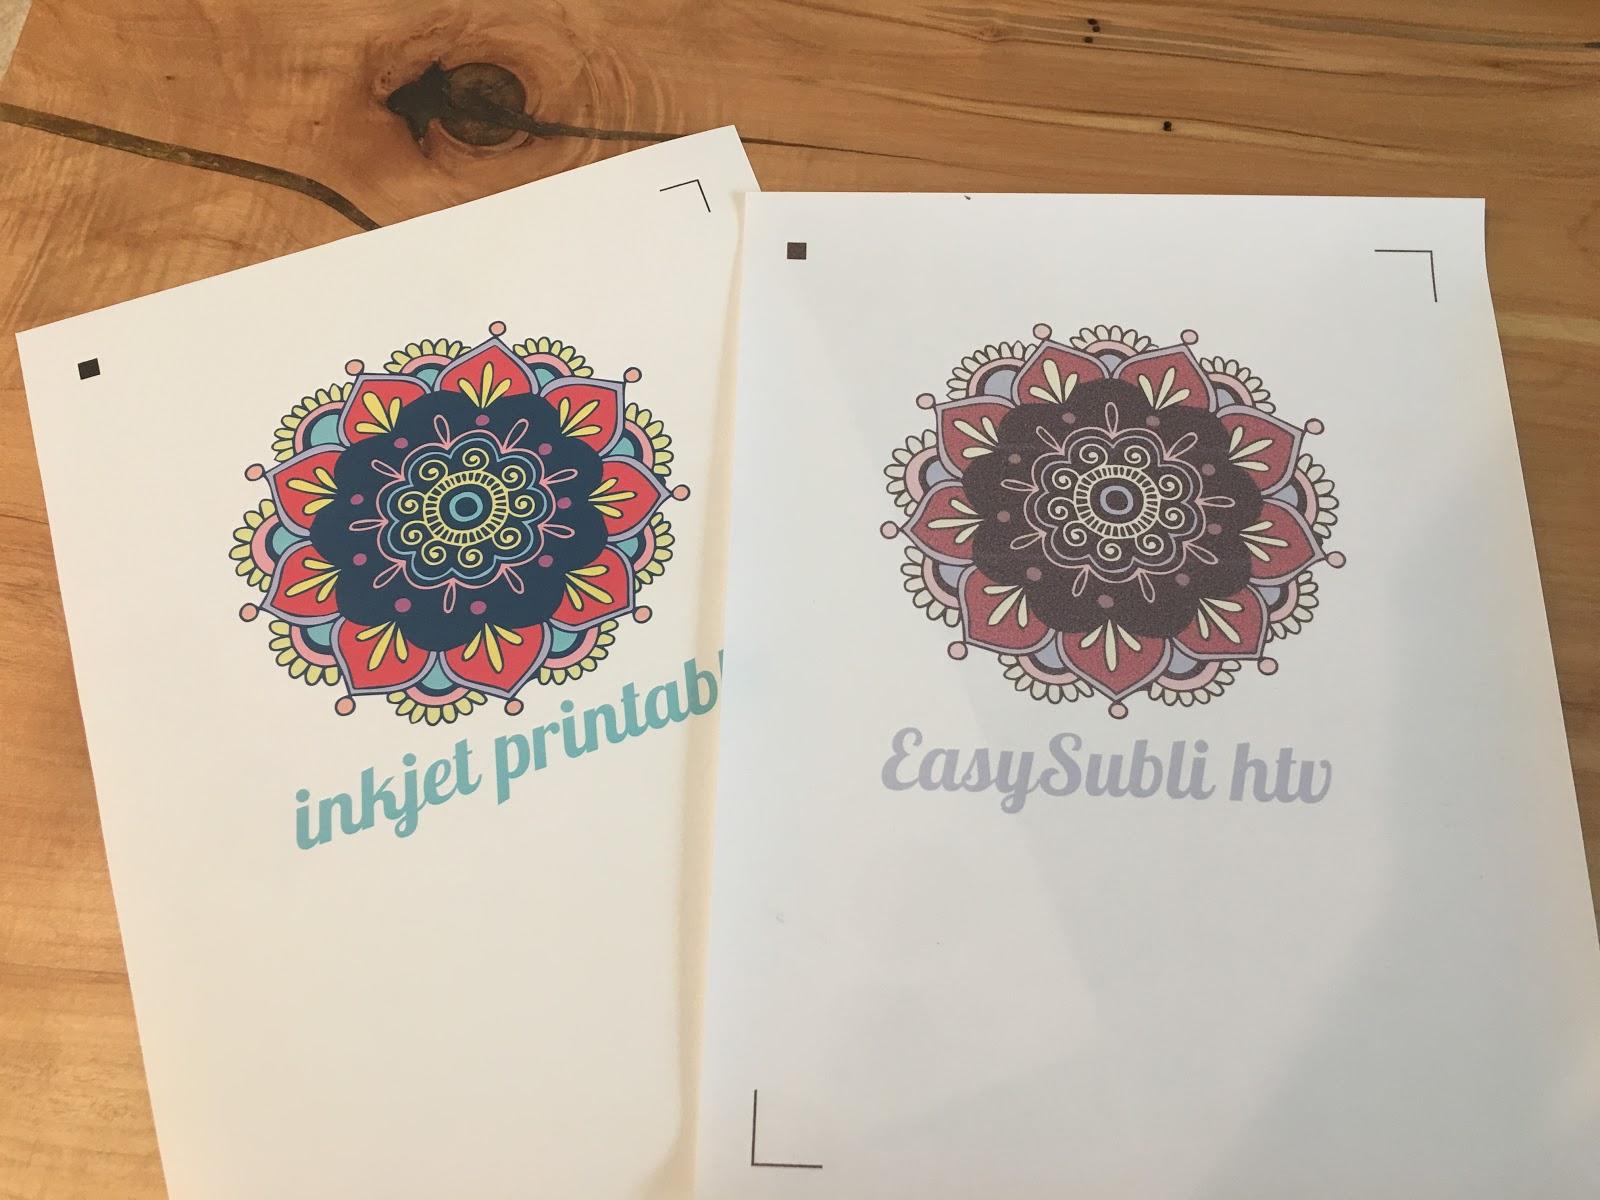 graphic about Starcraft Inkjet Printable Transfers known as Inkjet Printable HTV vs Siser EasySubli Warm Shift